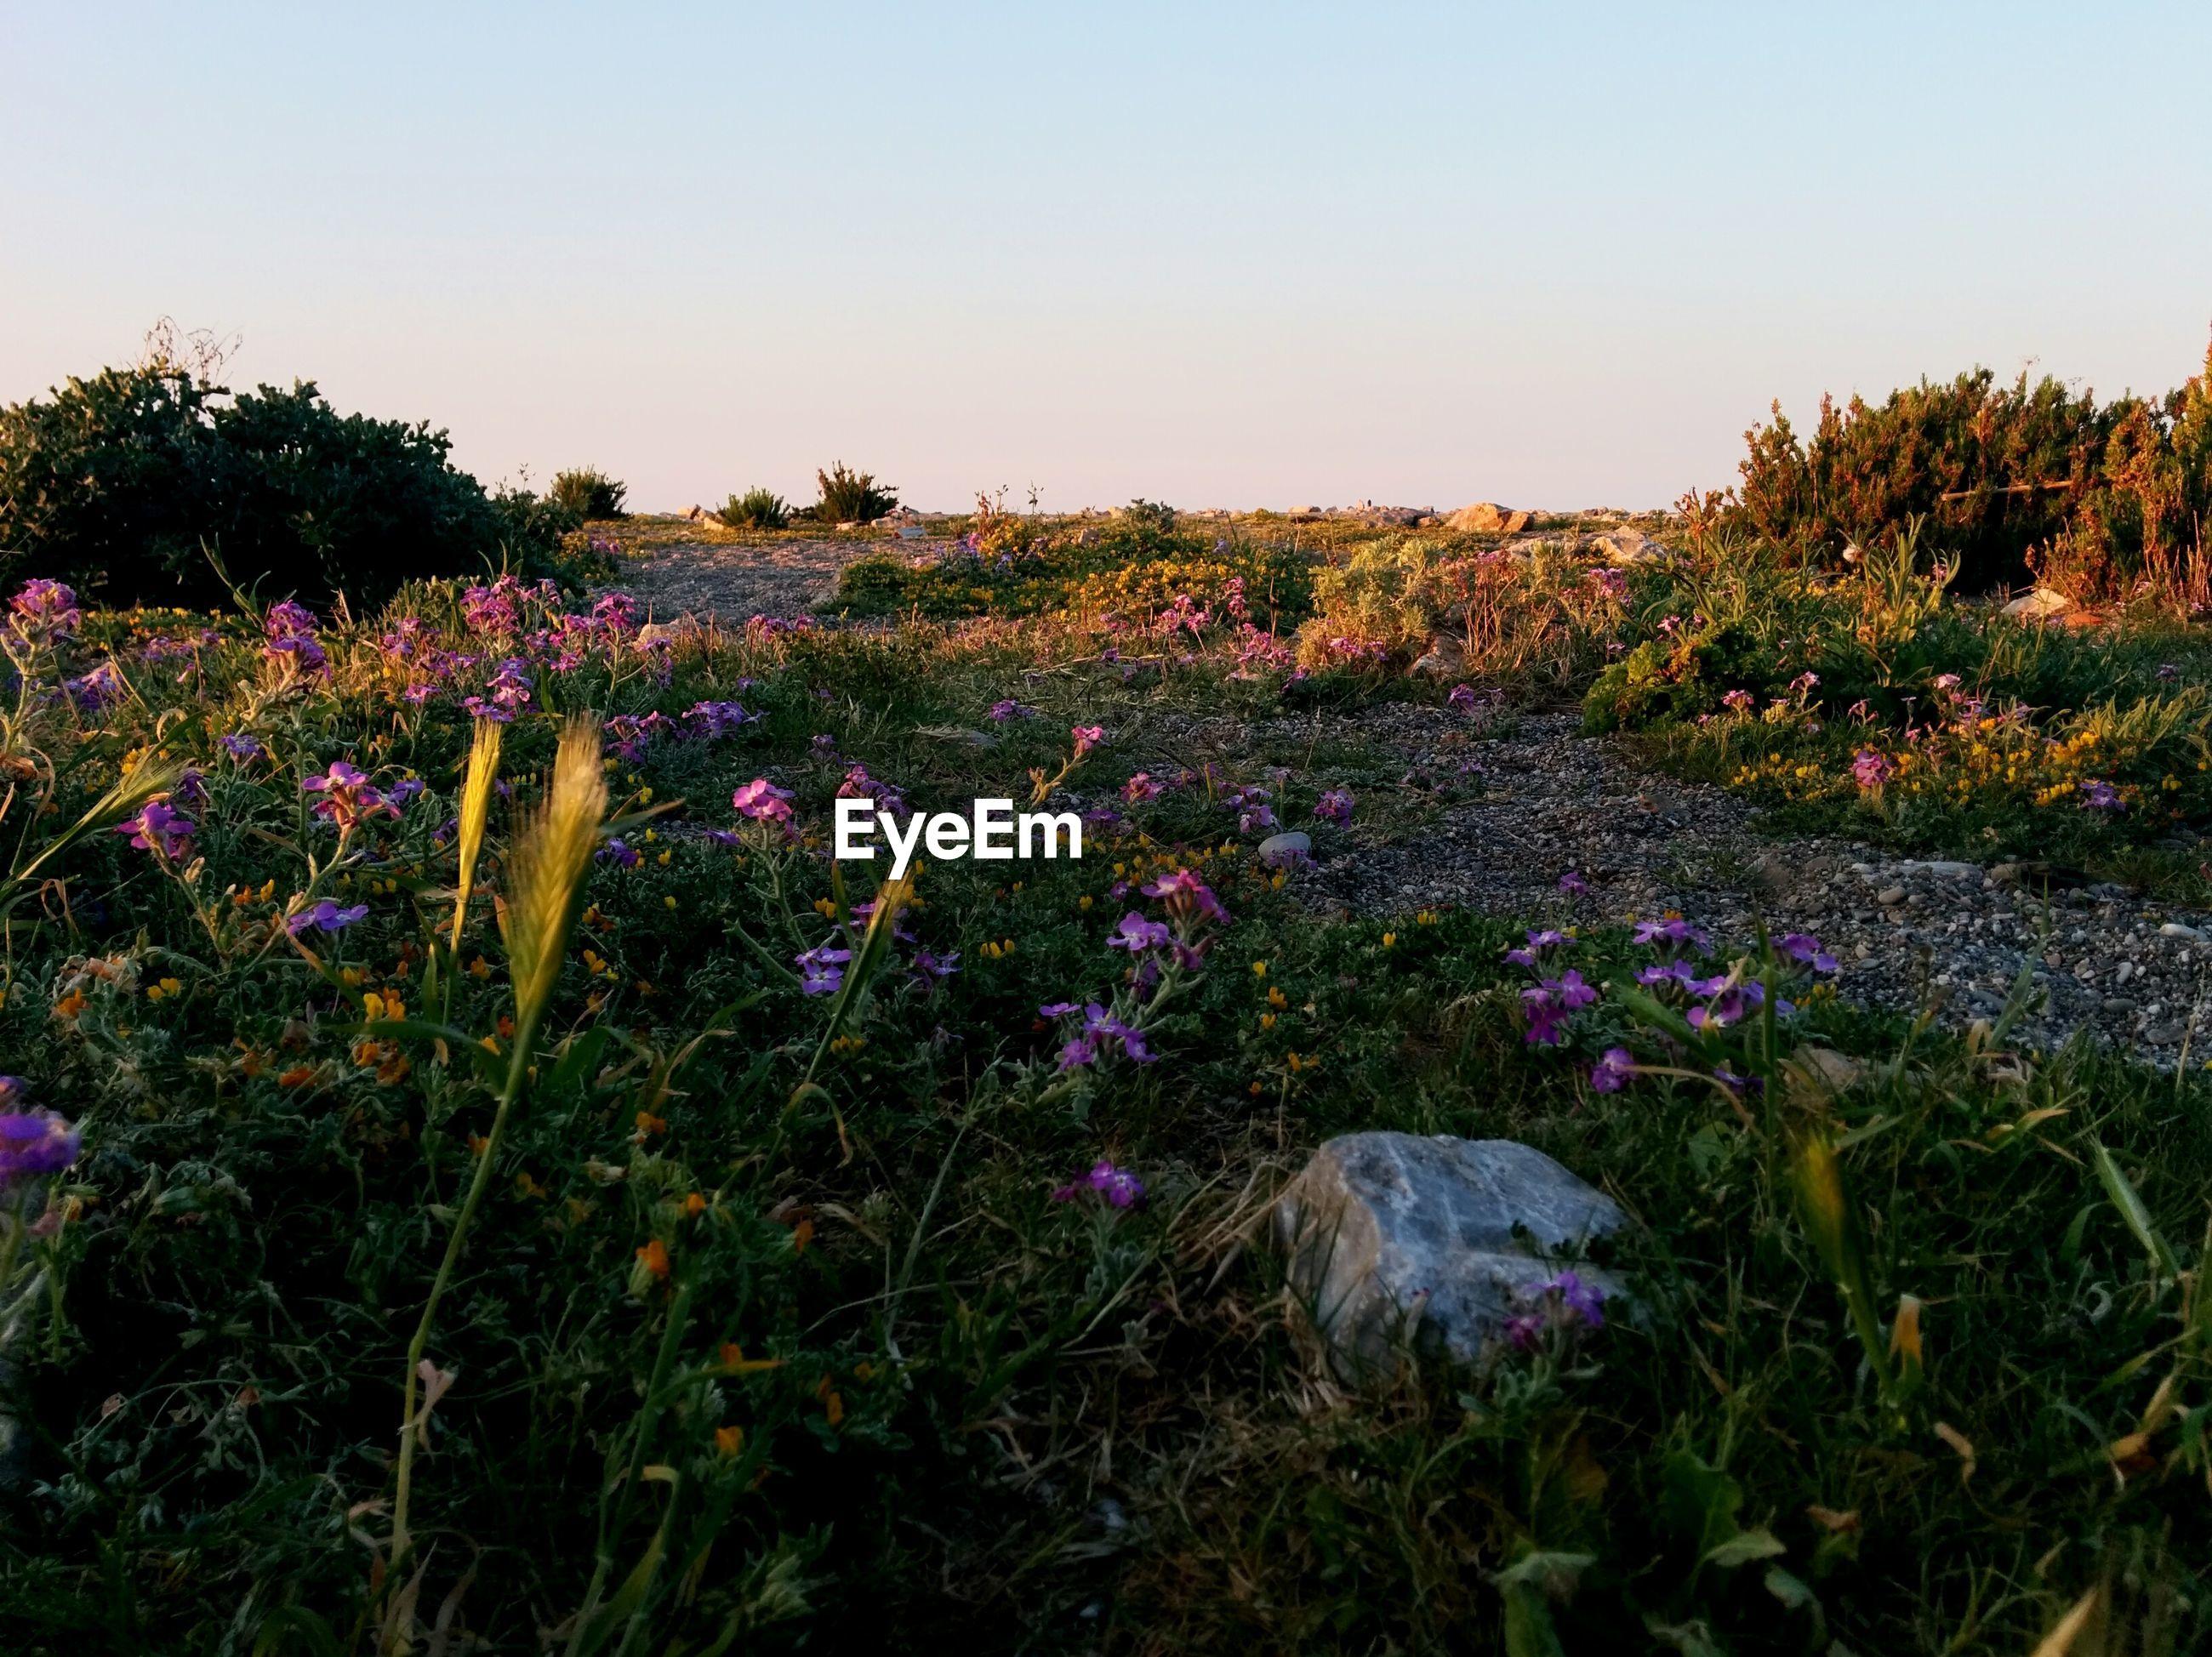 Flowers blooming in field against clear sky